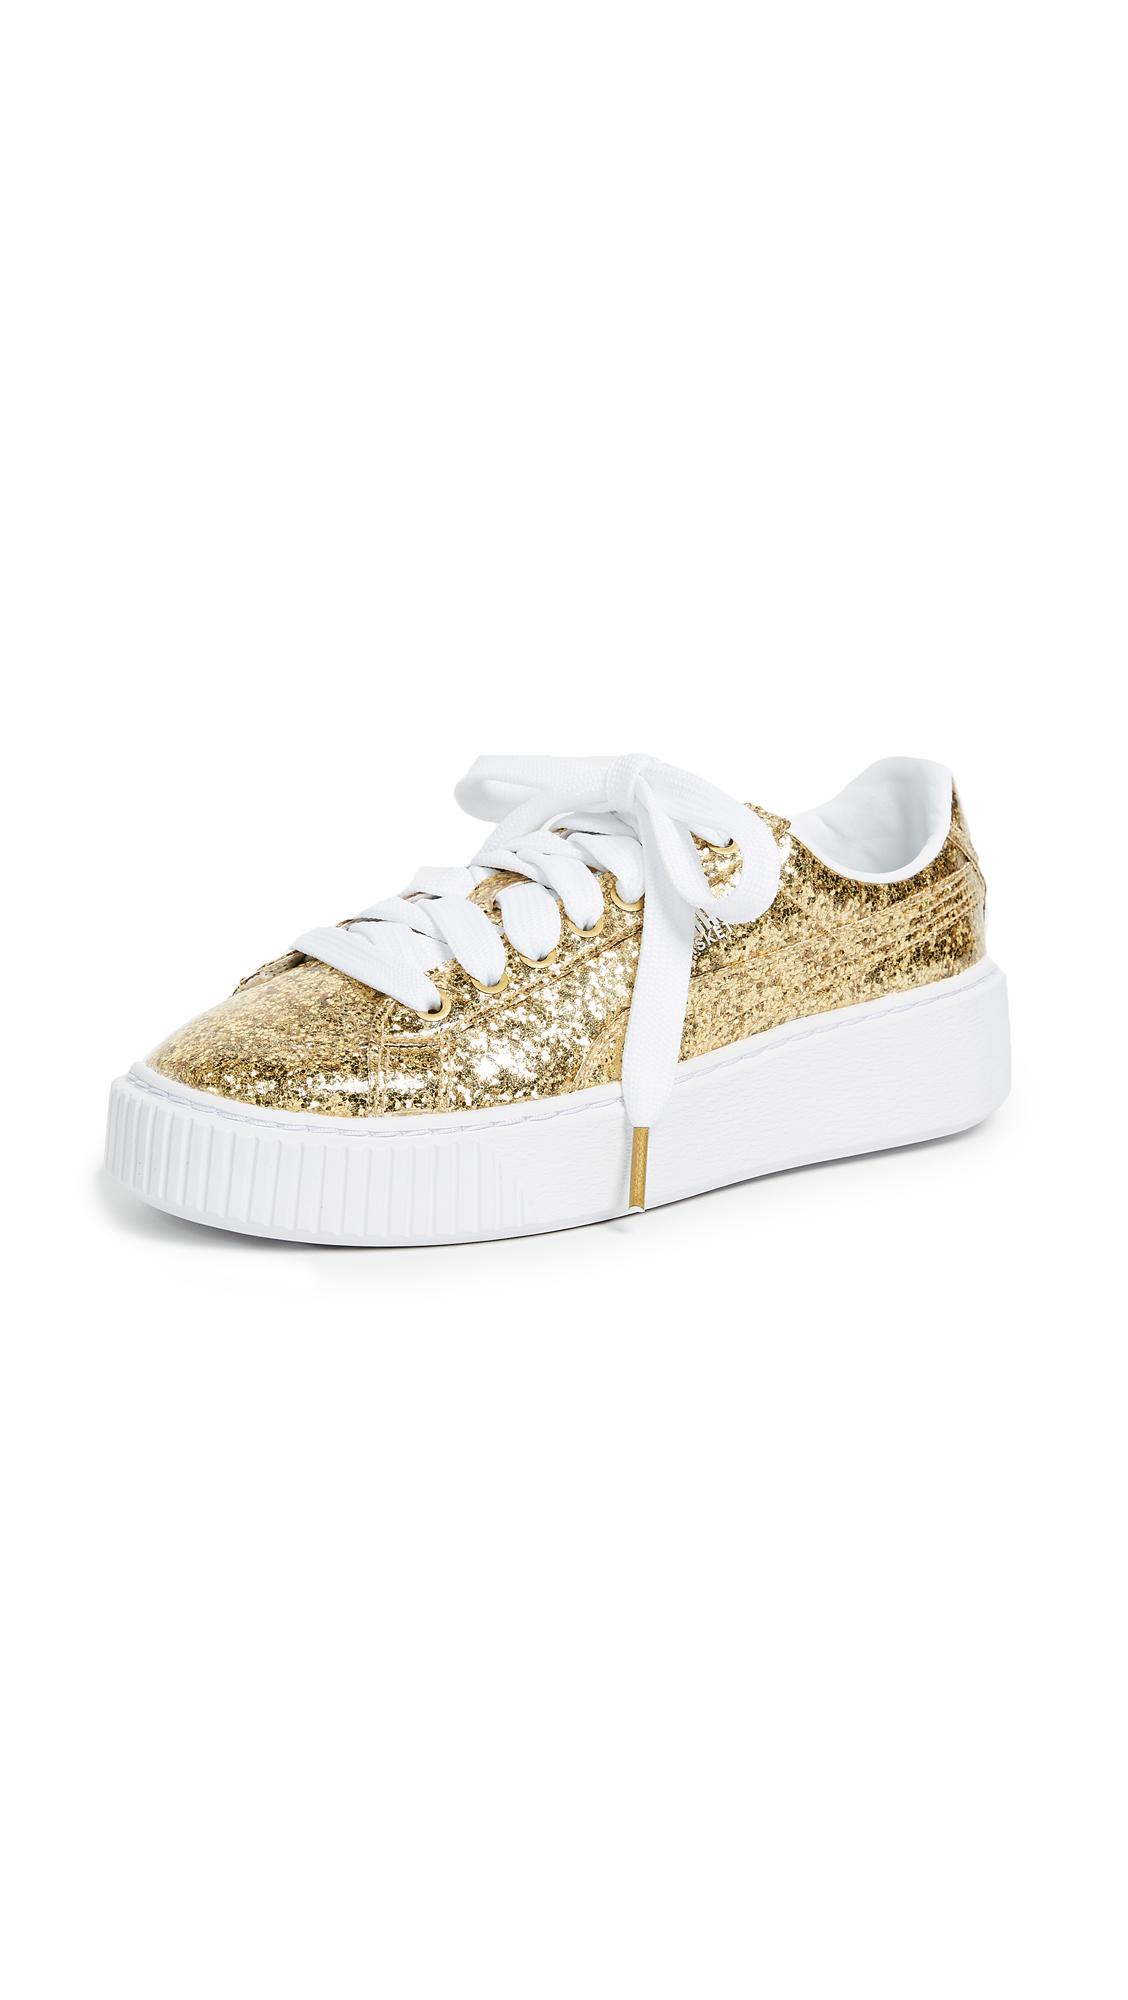 PUMA Basket Platform Glitter Sneakers - Gold/Gold